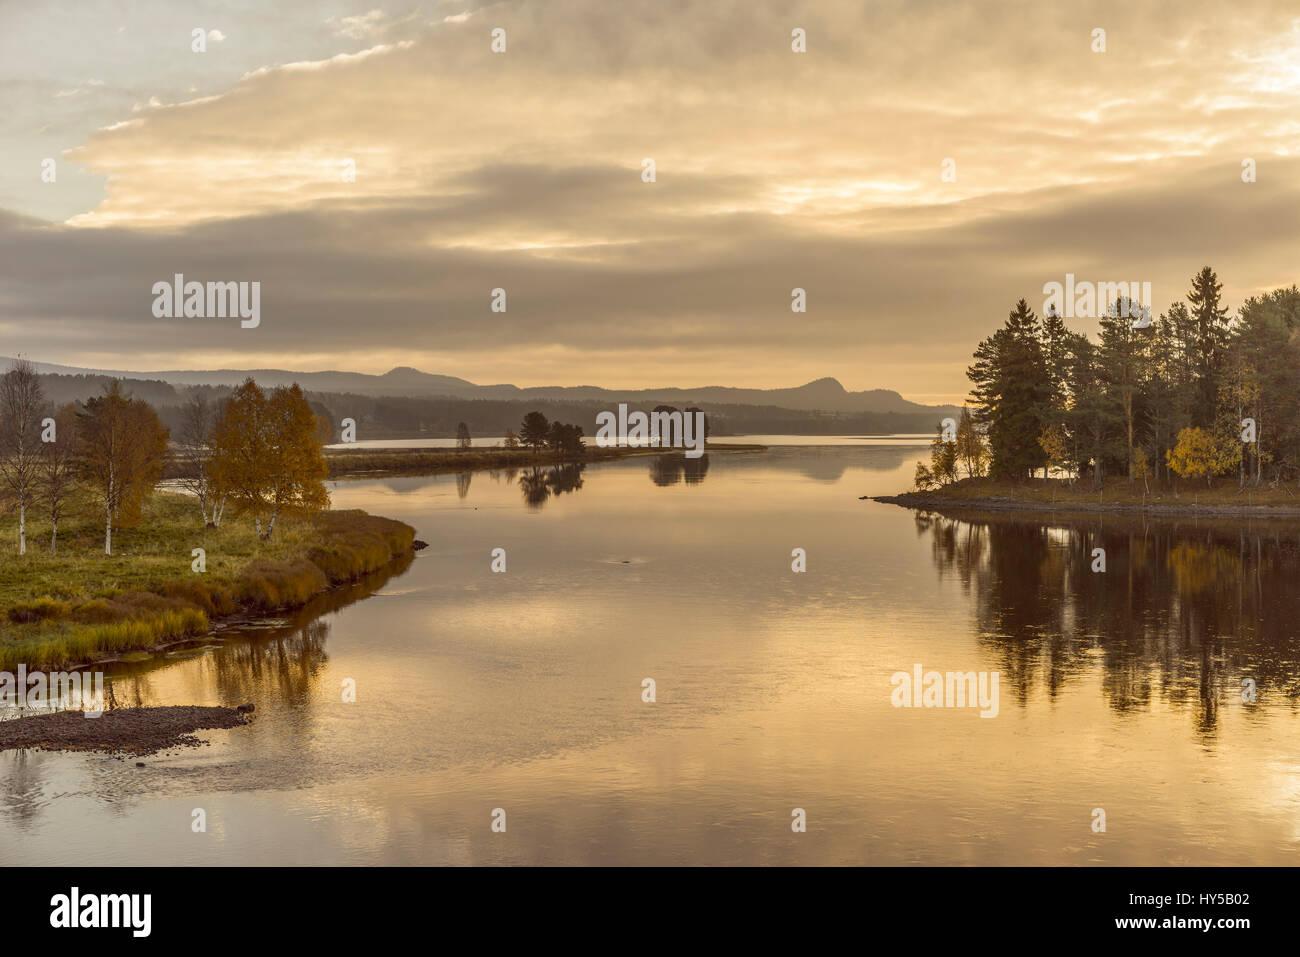 Sweden, Dalarna, Fulufjellet National Park, Njupeskar - Stock Image